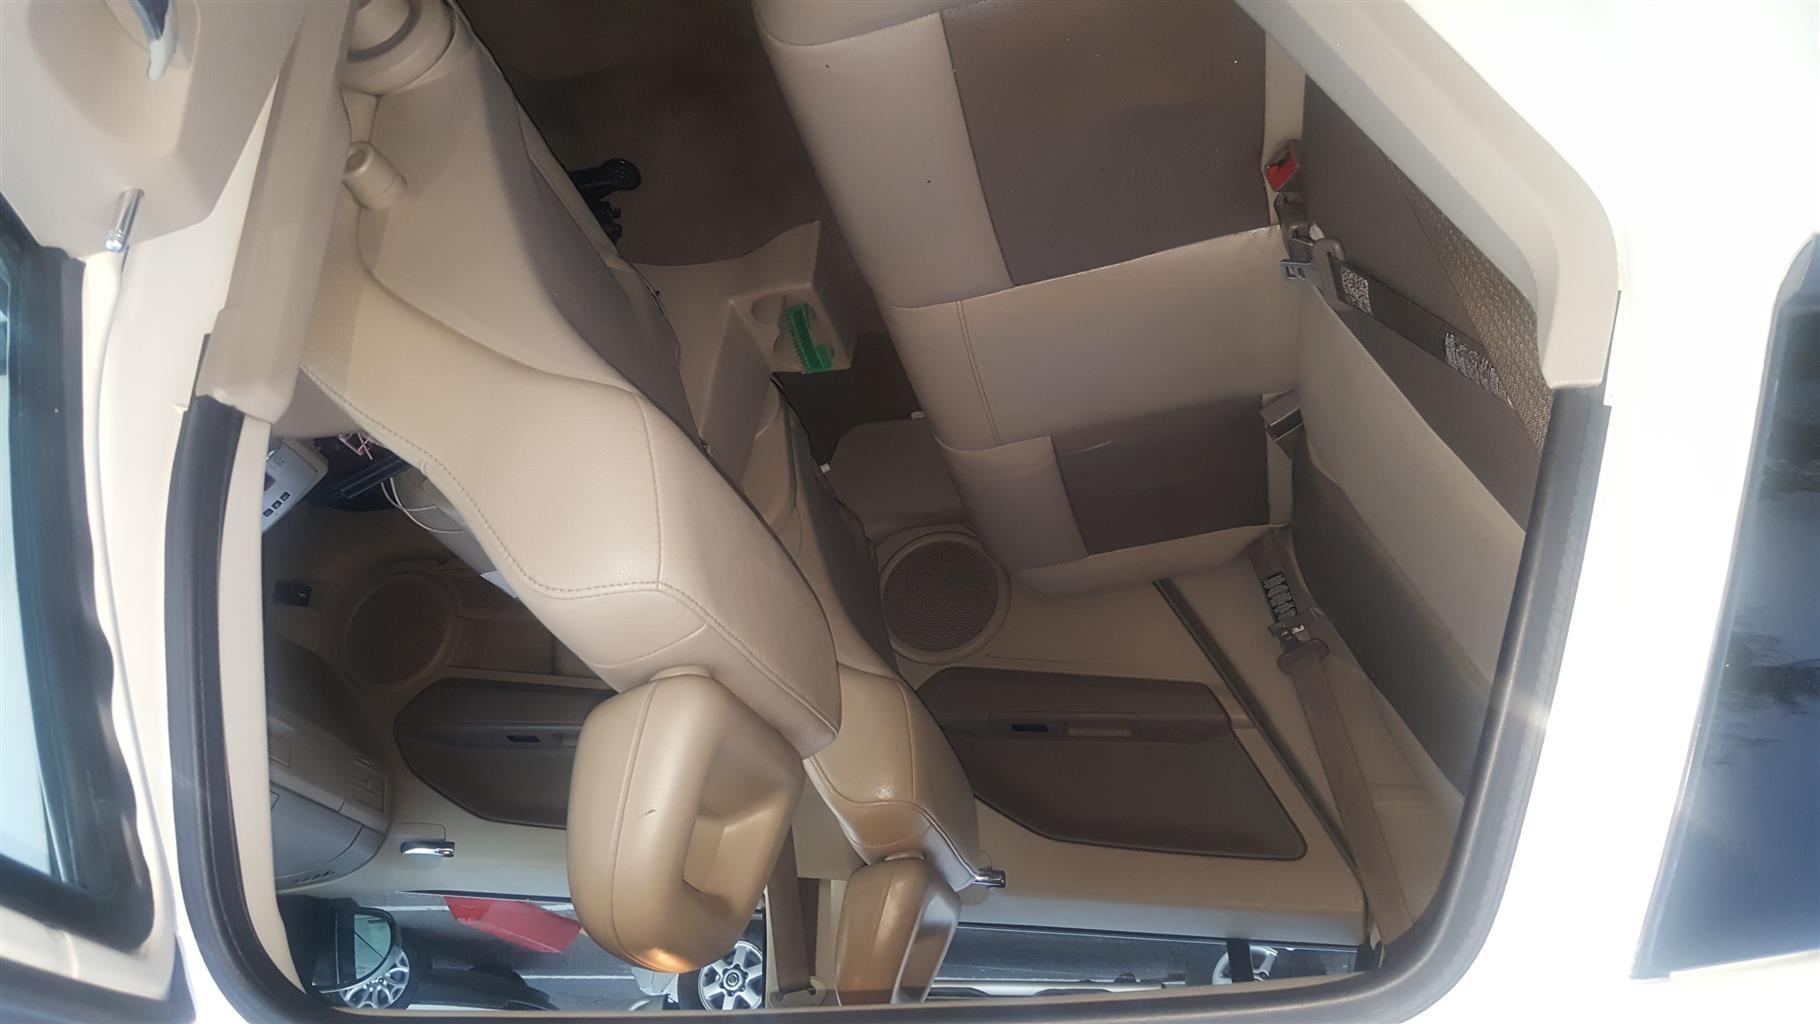 2008 Dodge Caliber 1.8 SXT